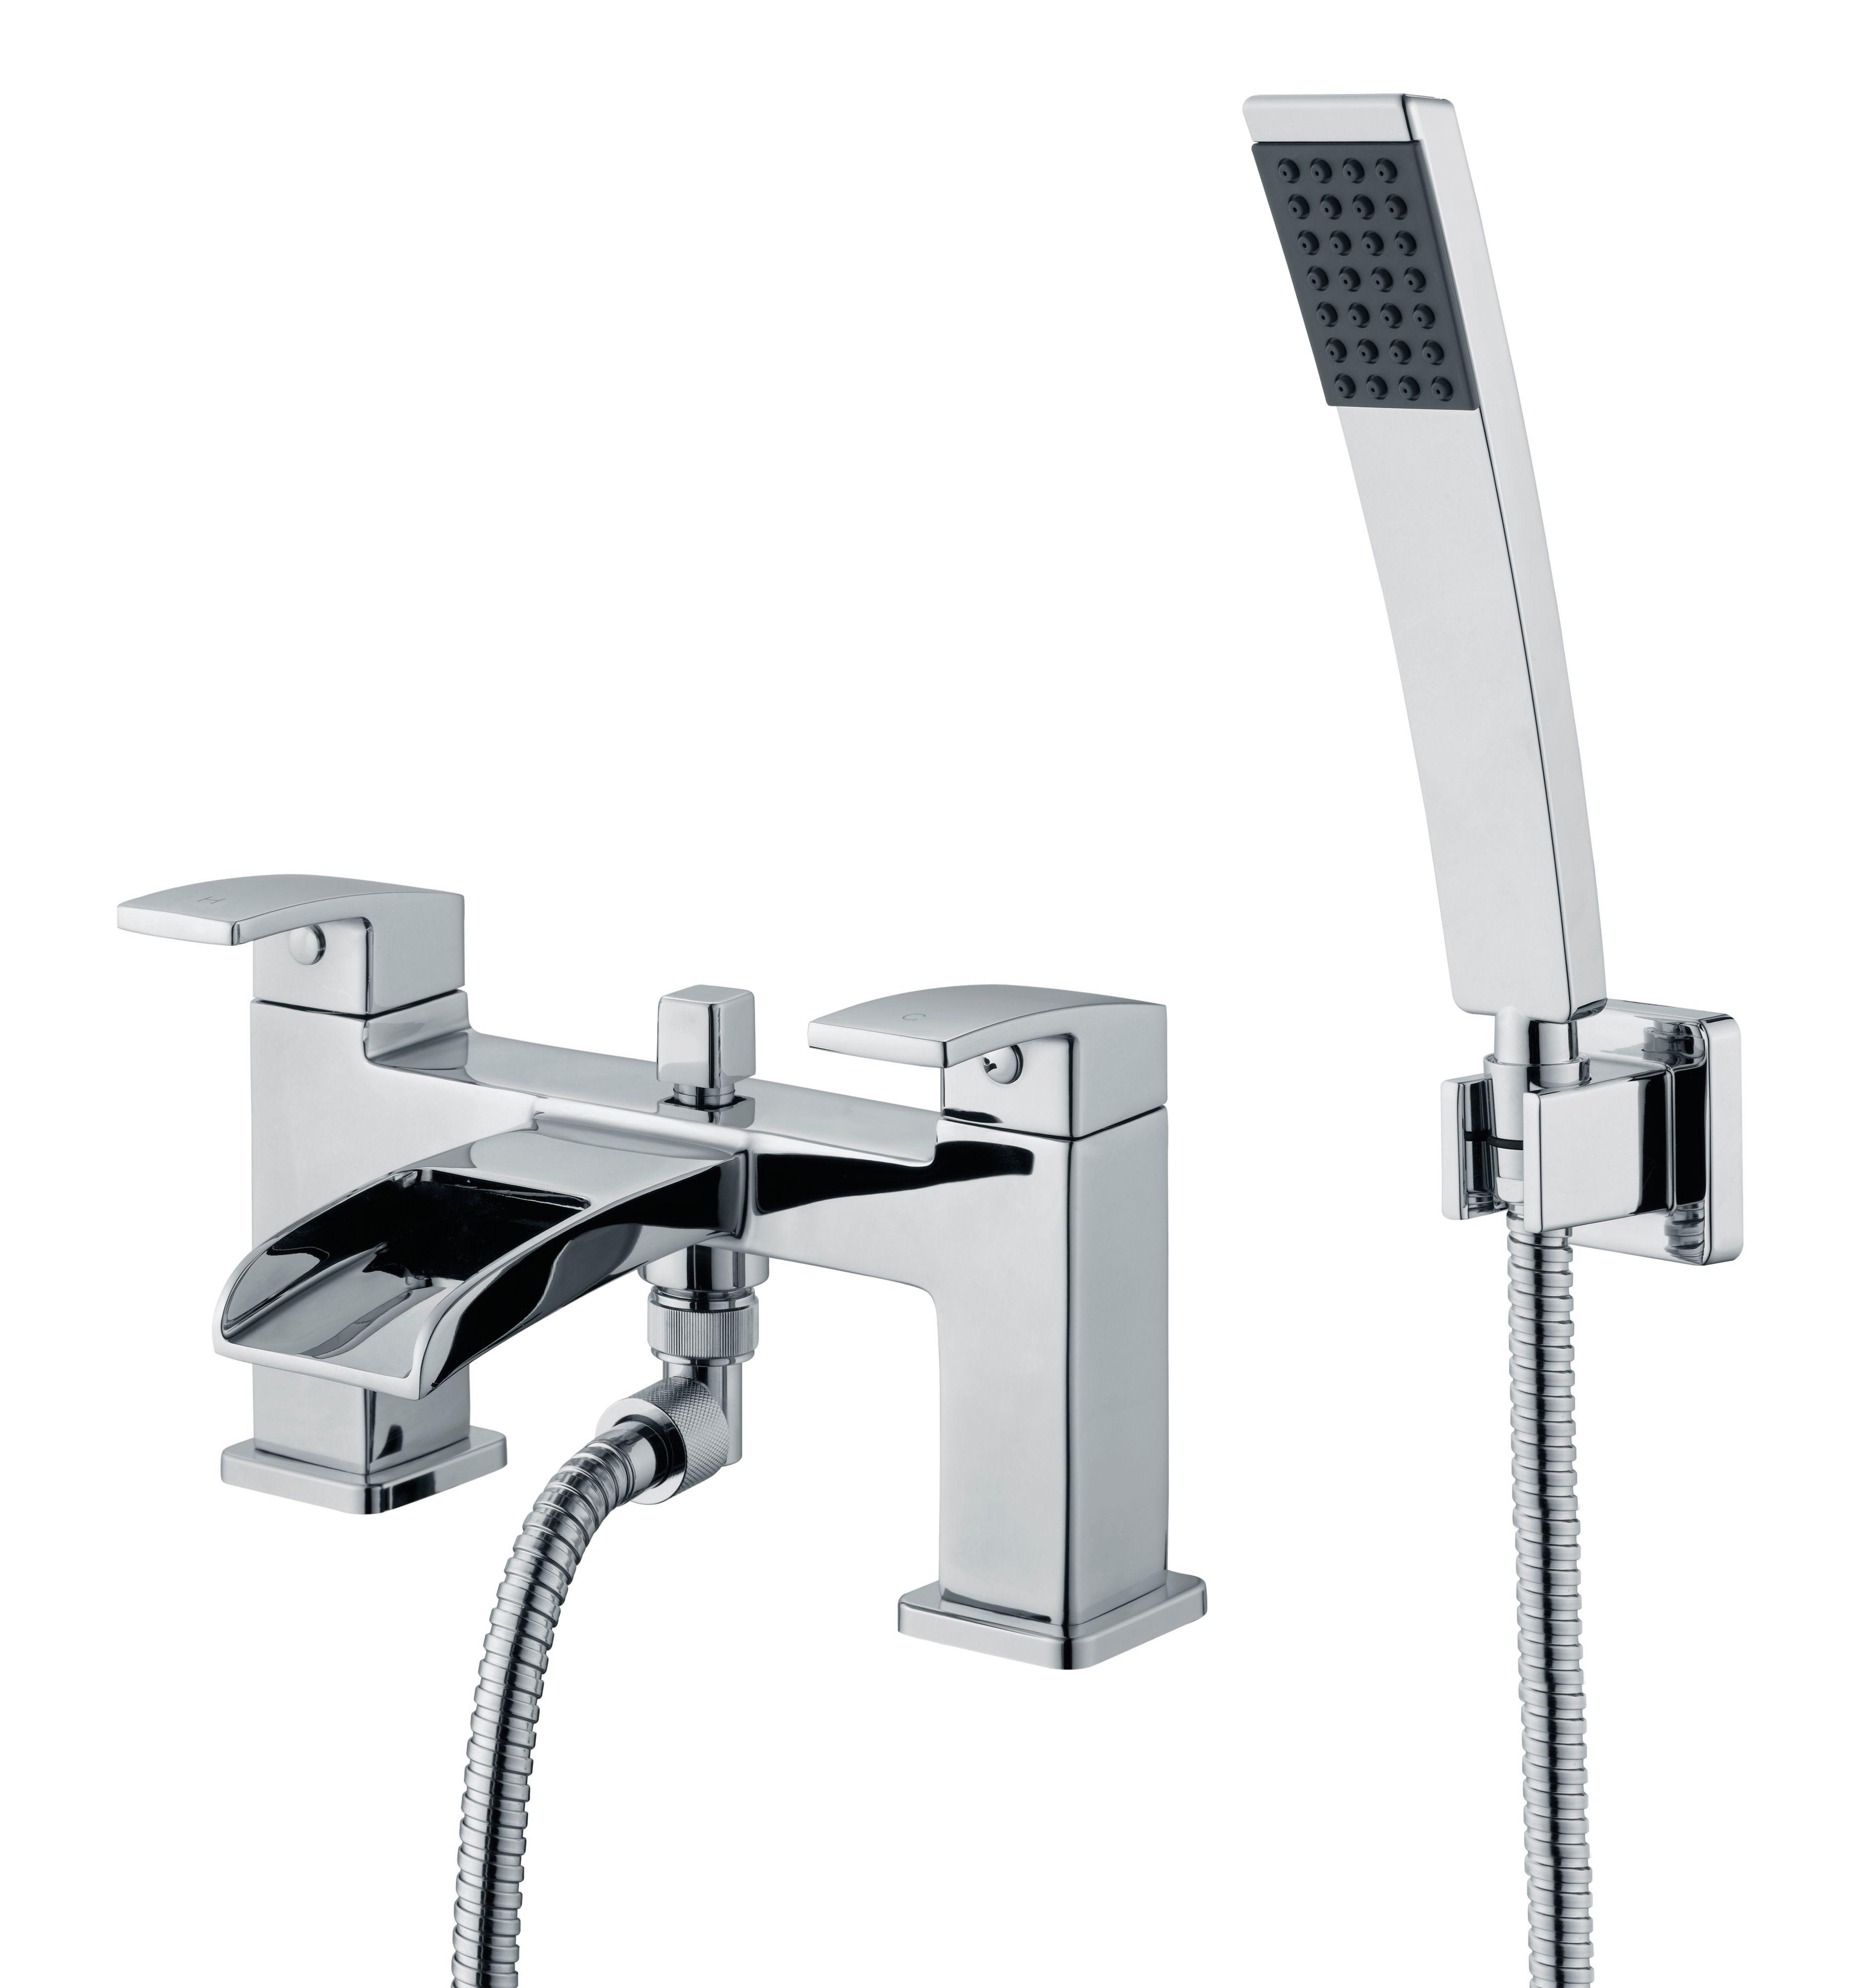 cooke lewis havasu waterfall chrome bath shower mixer tap cooke lewis havasu waterfall chrome bath shower mixer tap departments diy at b q